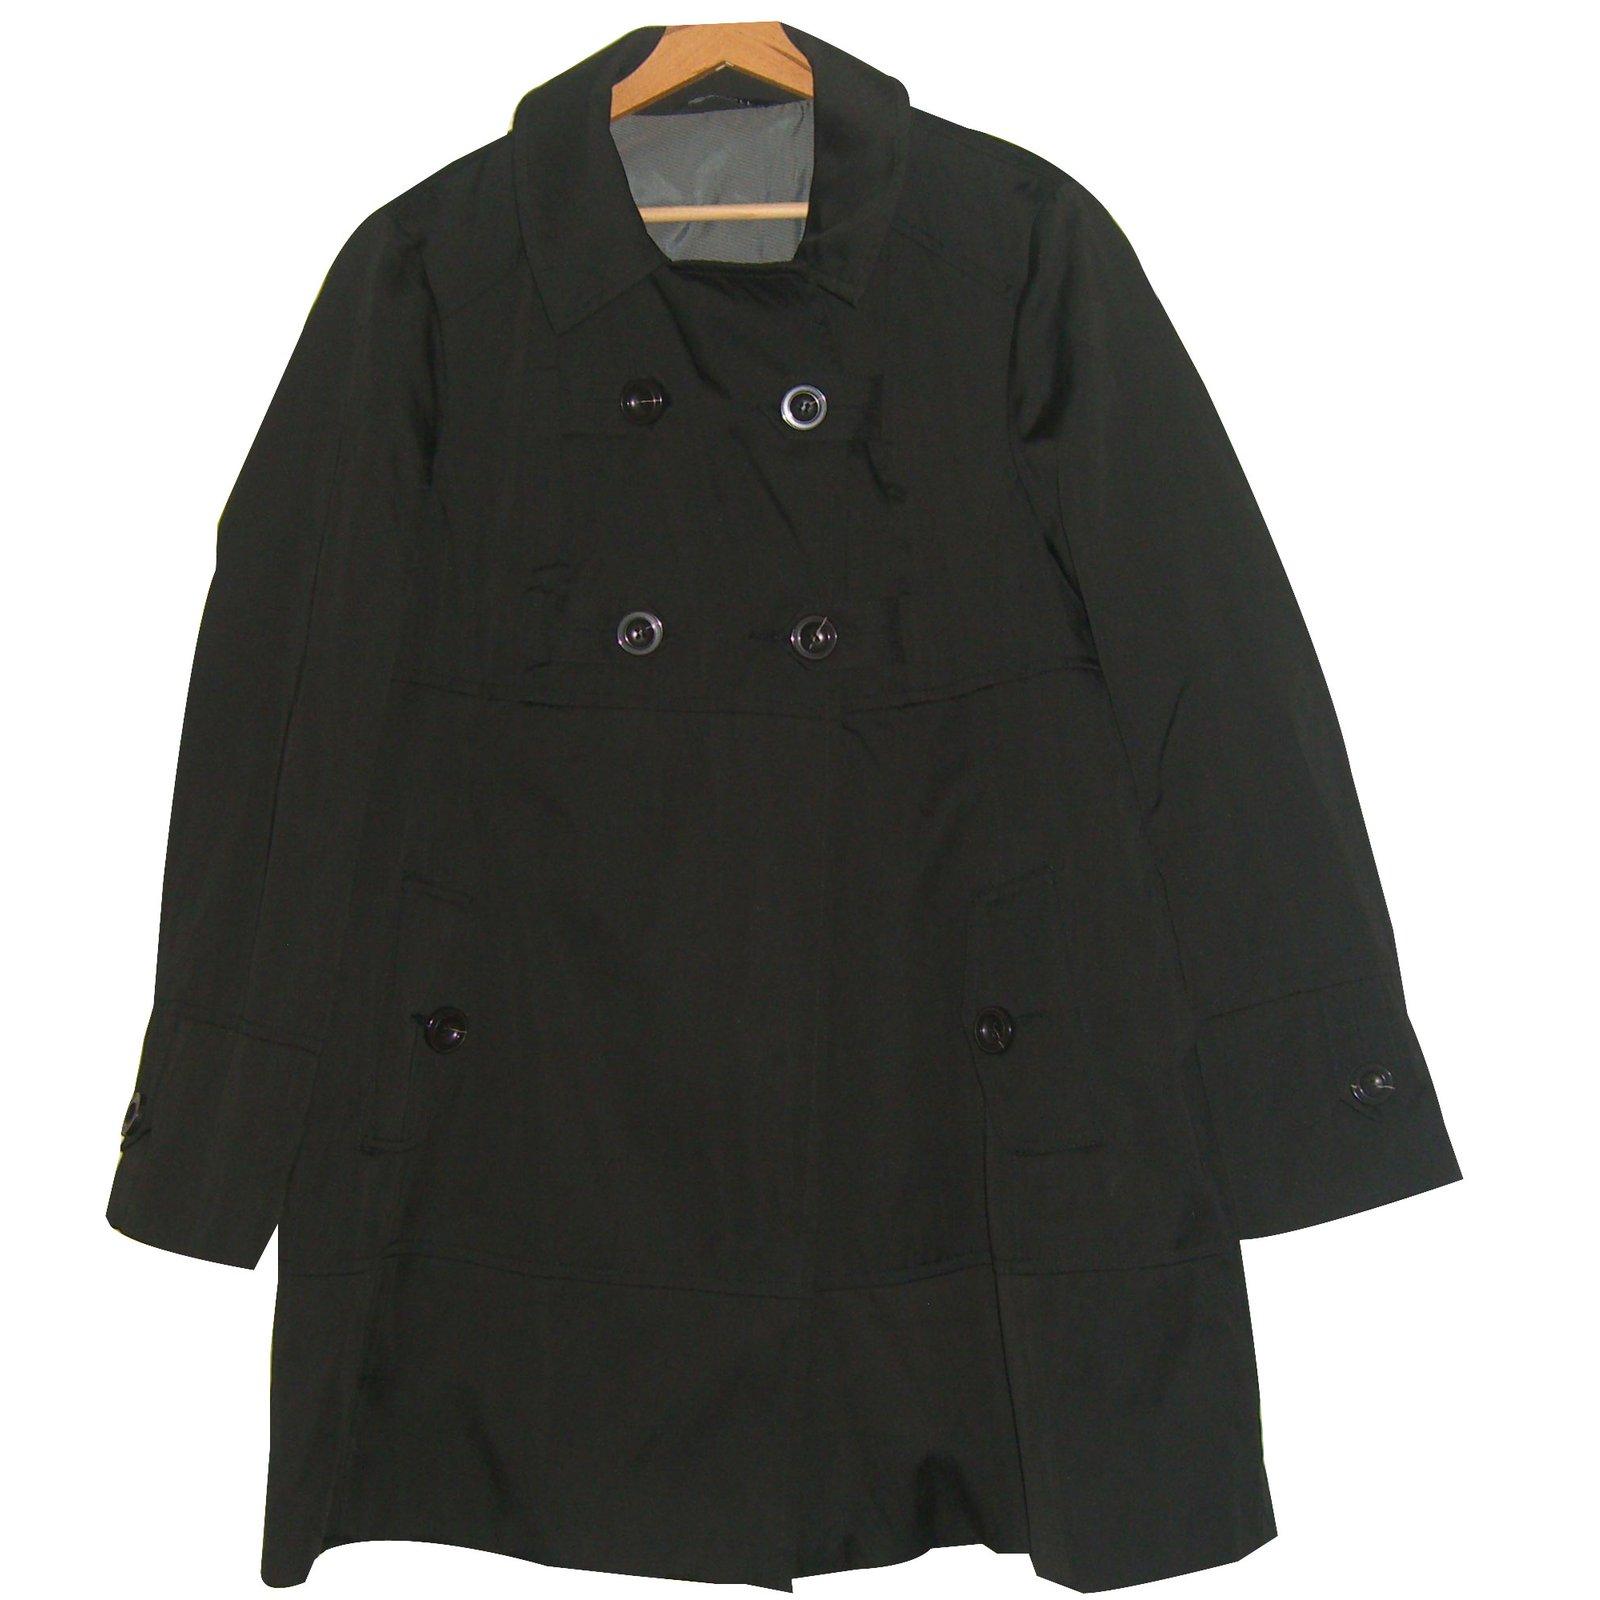 743111f6e59be Trenchs Autre Marque Trench  Caroll  Polyester Noir ref.26410 - Joli Closet